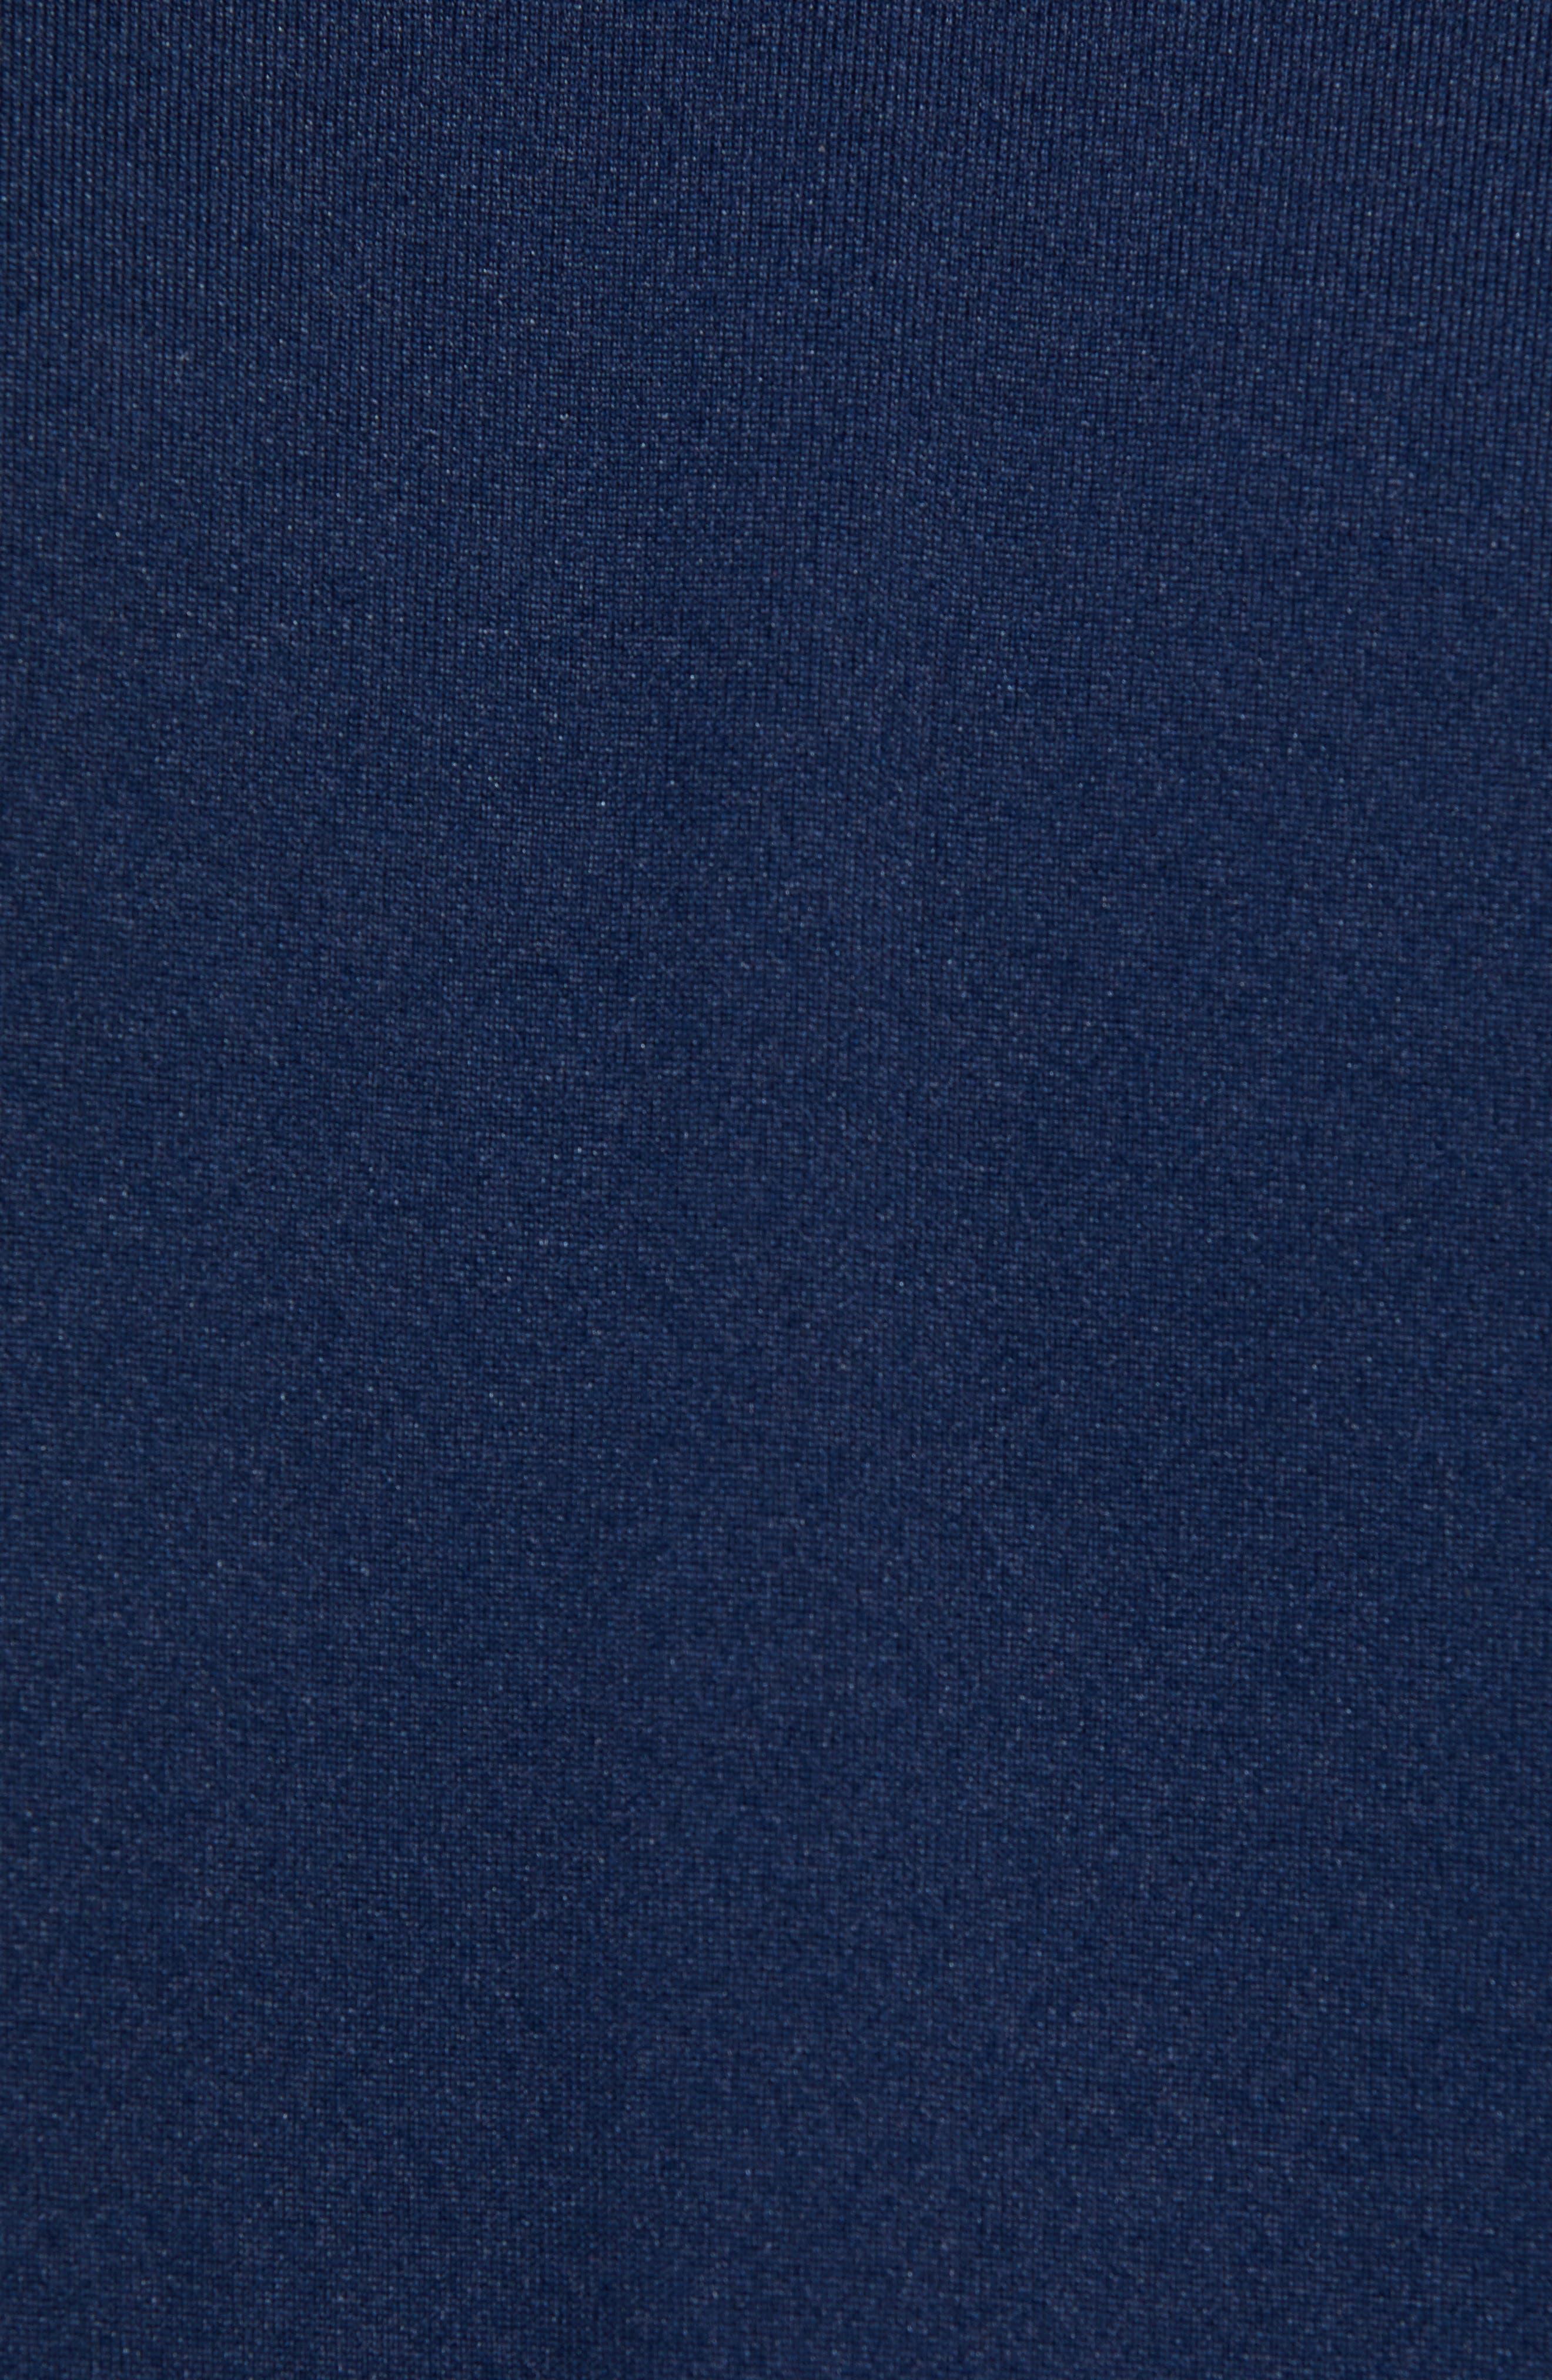 adidas SST Track Jacket,                             Alternate thumbnail 7, color,                             COLLEGIATE NAVY